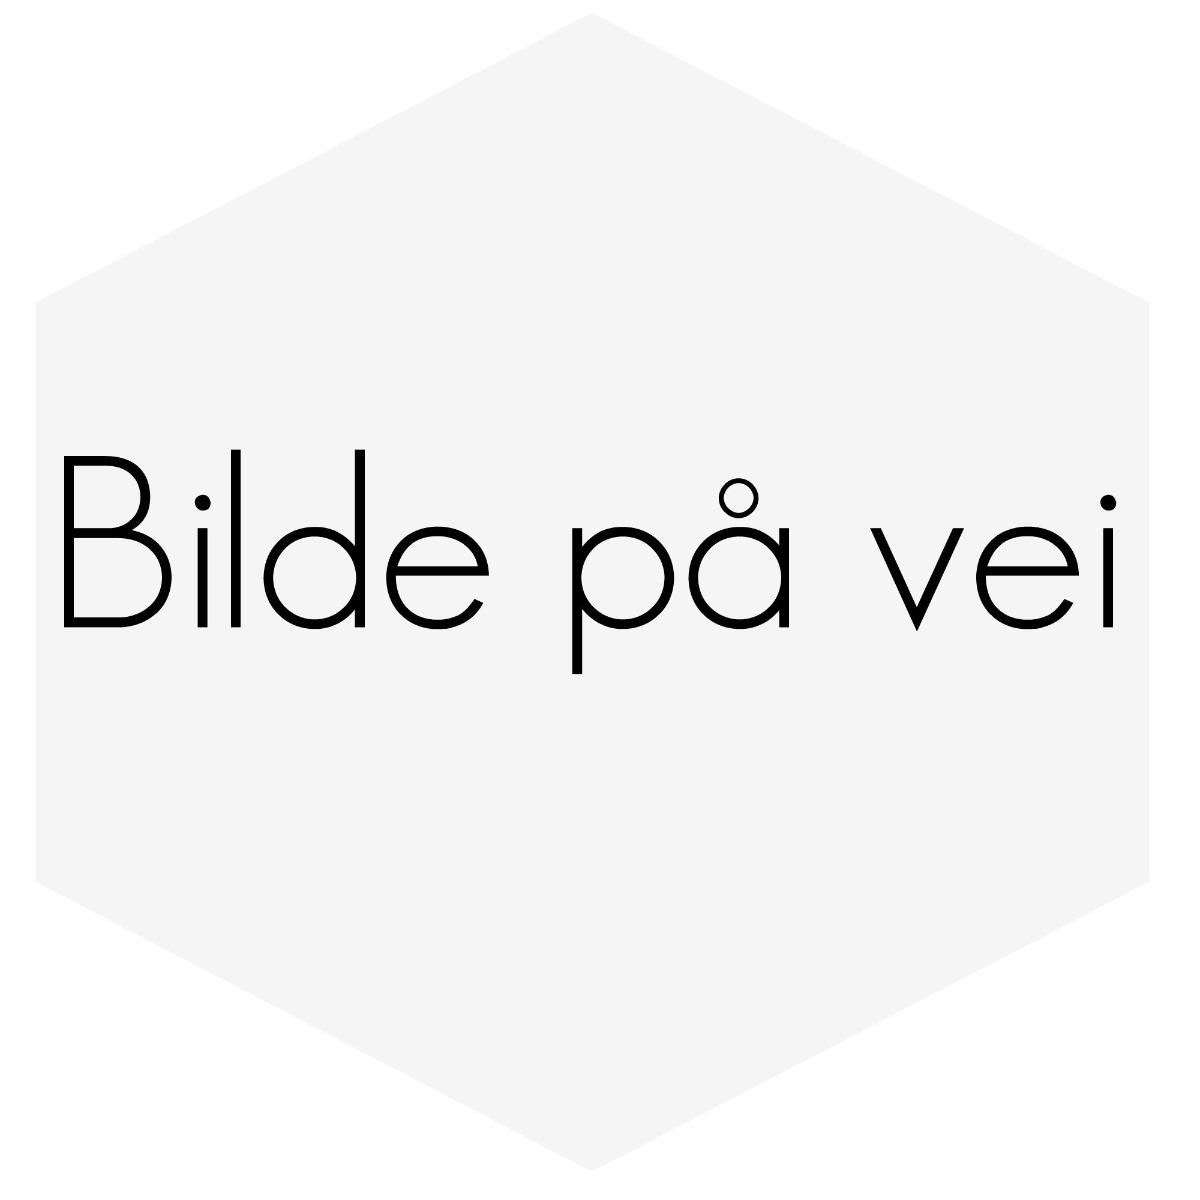 KOMPLETT FJÆRBEN FORAN TIL VOLVO V70,S80 SE INFO